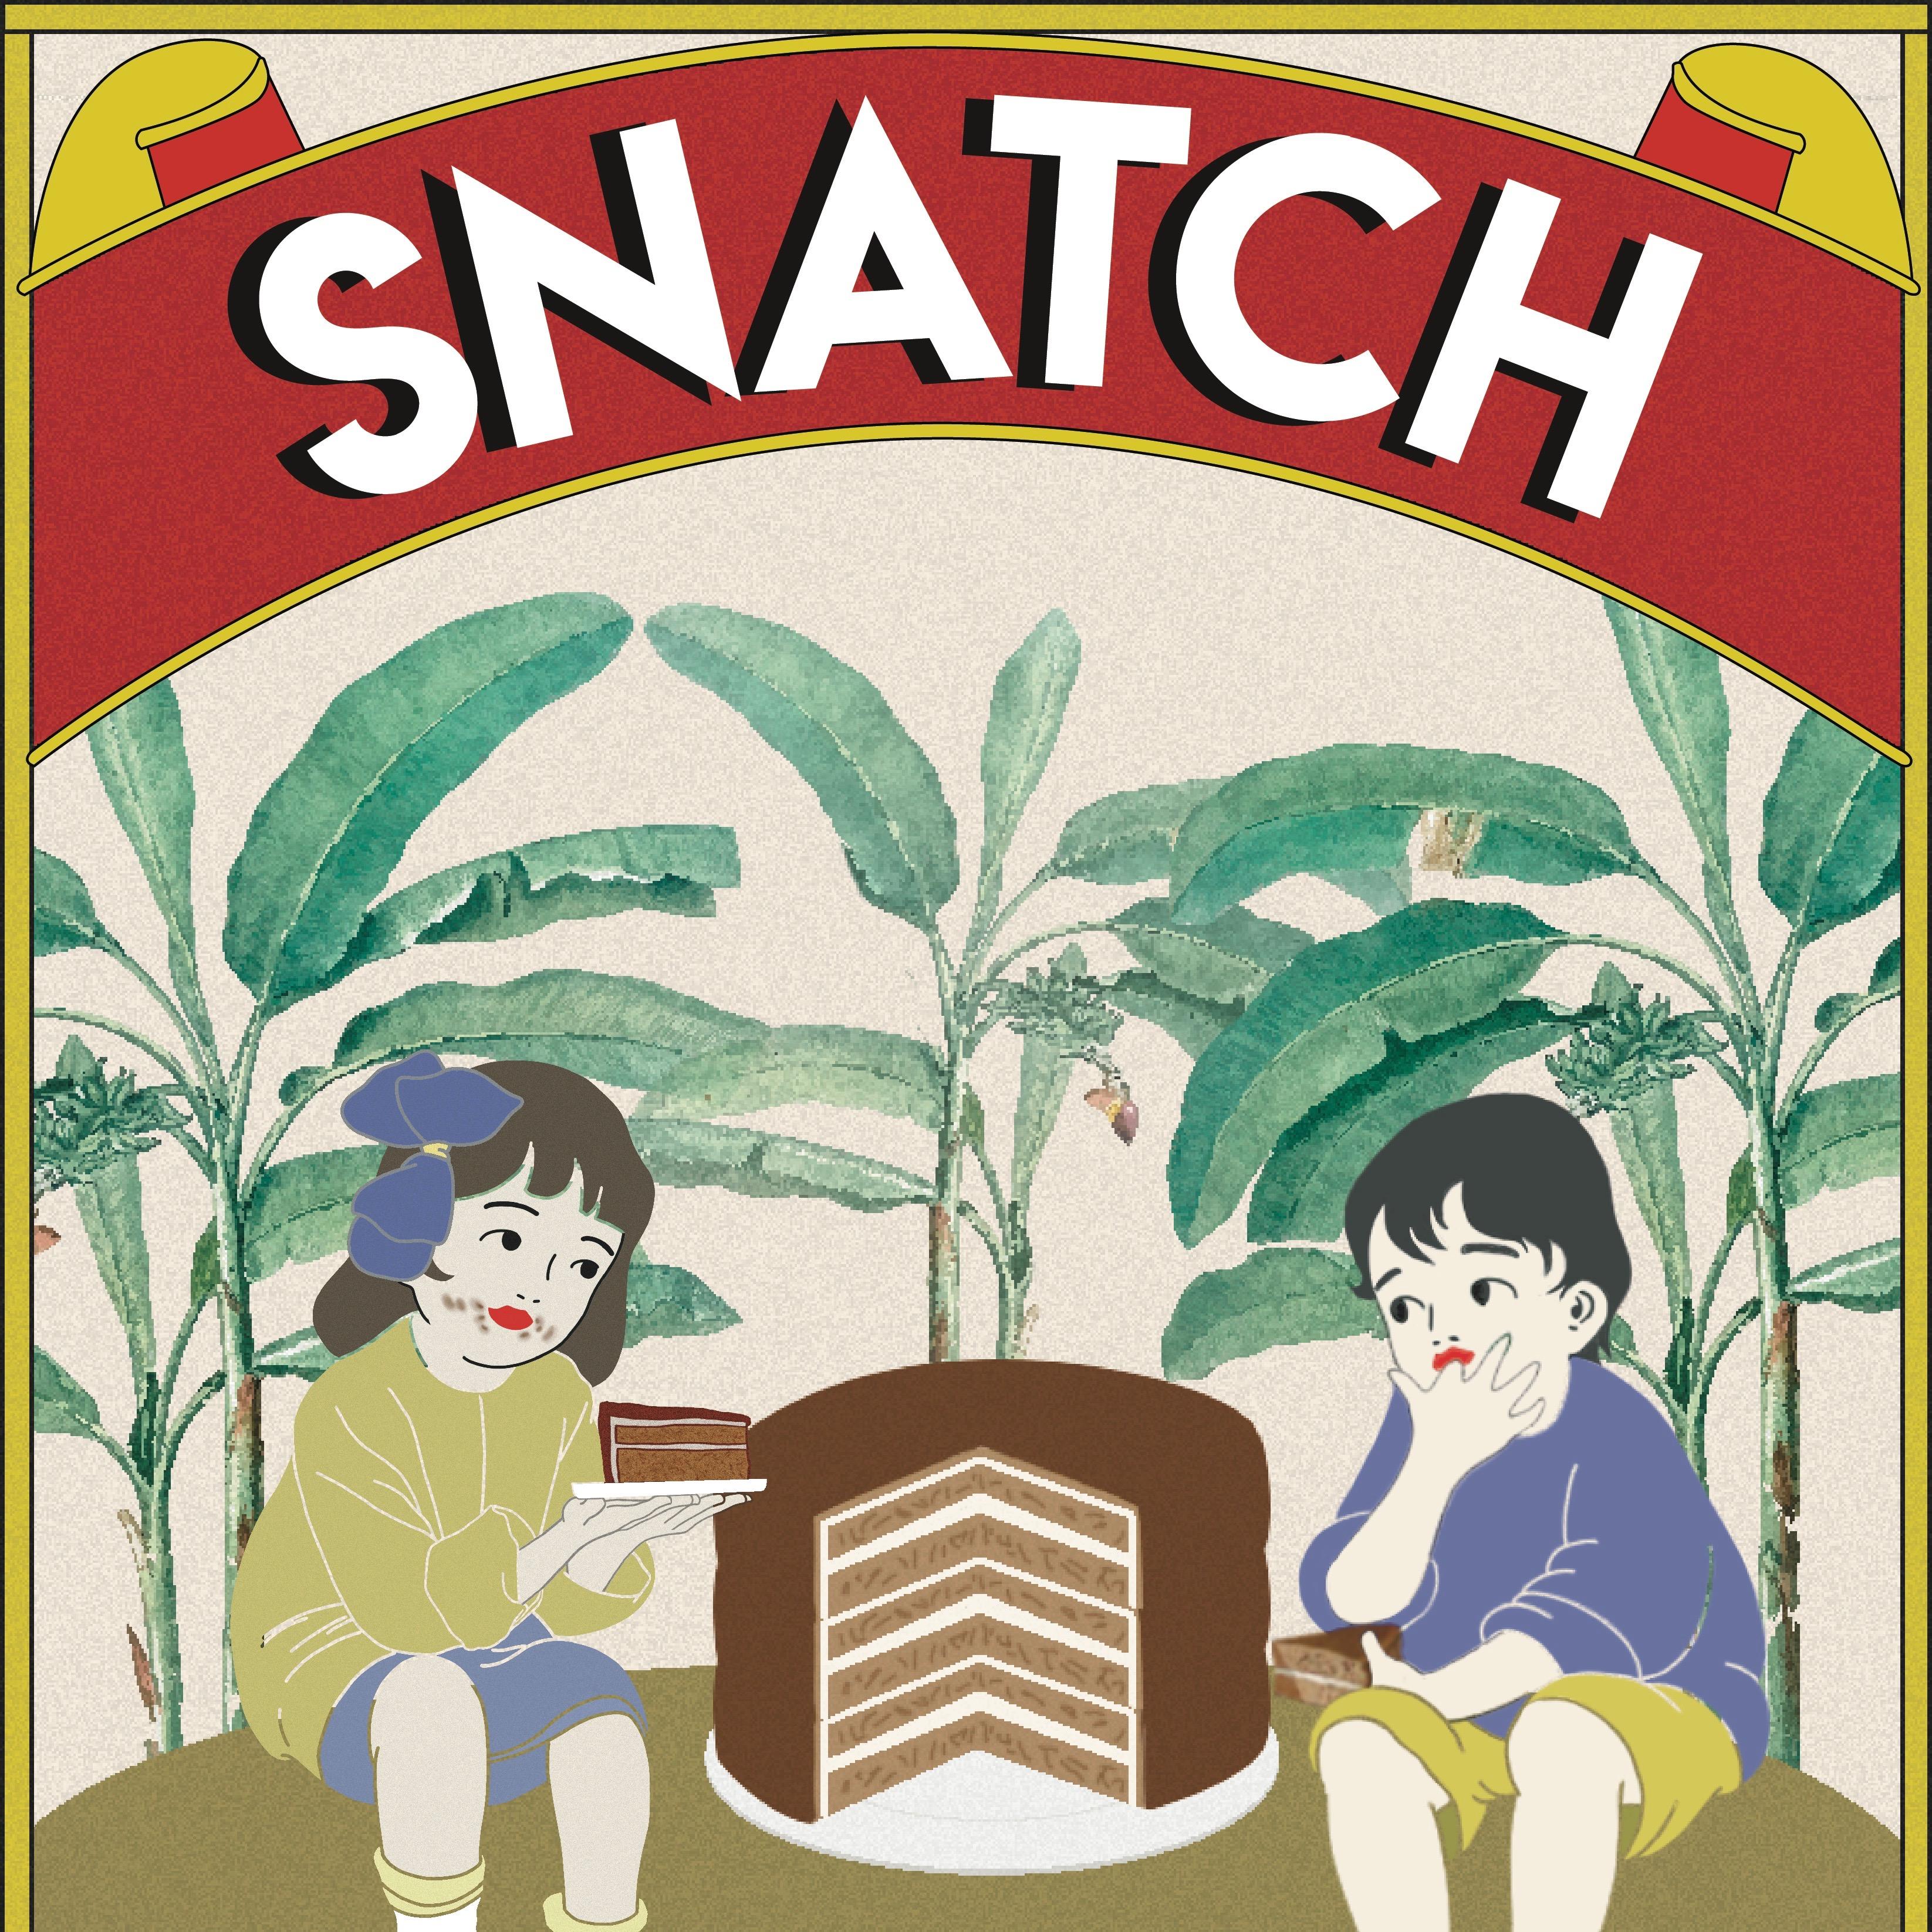 Snatch Pastries